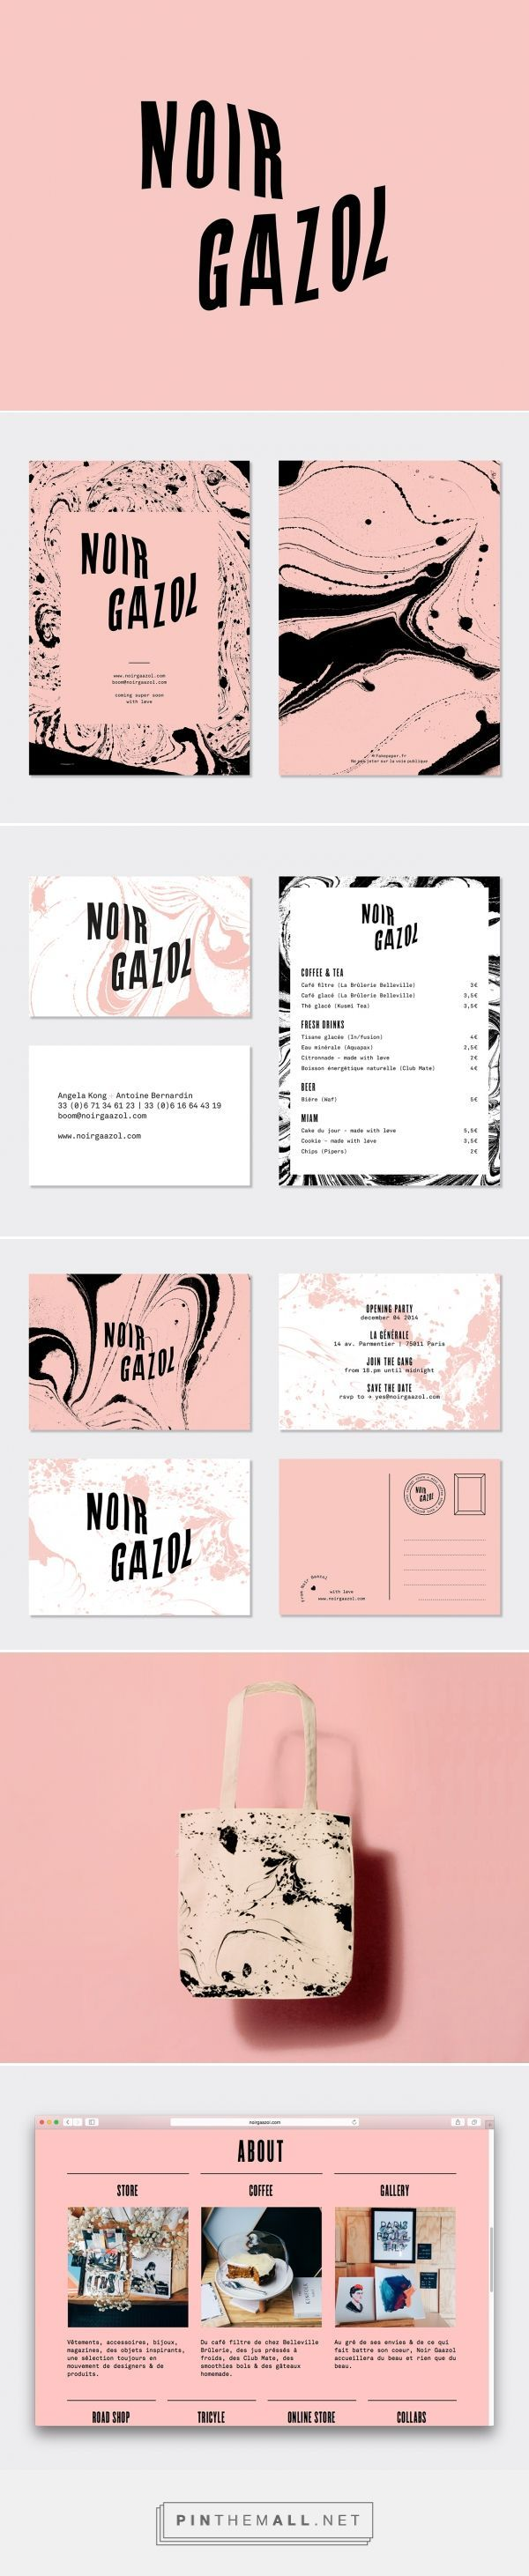 Ine design stone 187 other products - Noir Gaazol Branding By Fakepaper